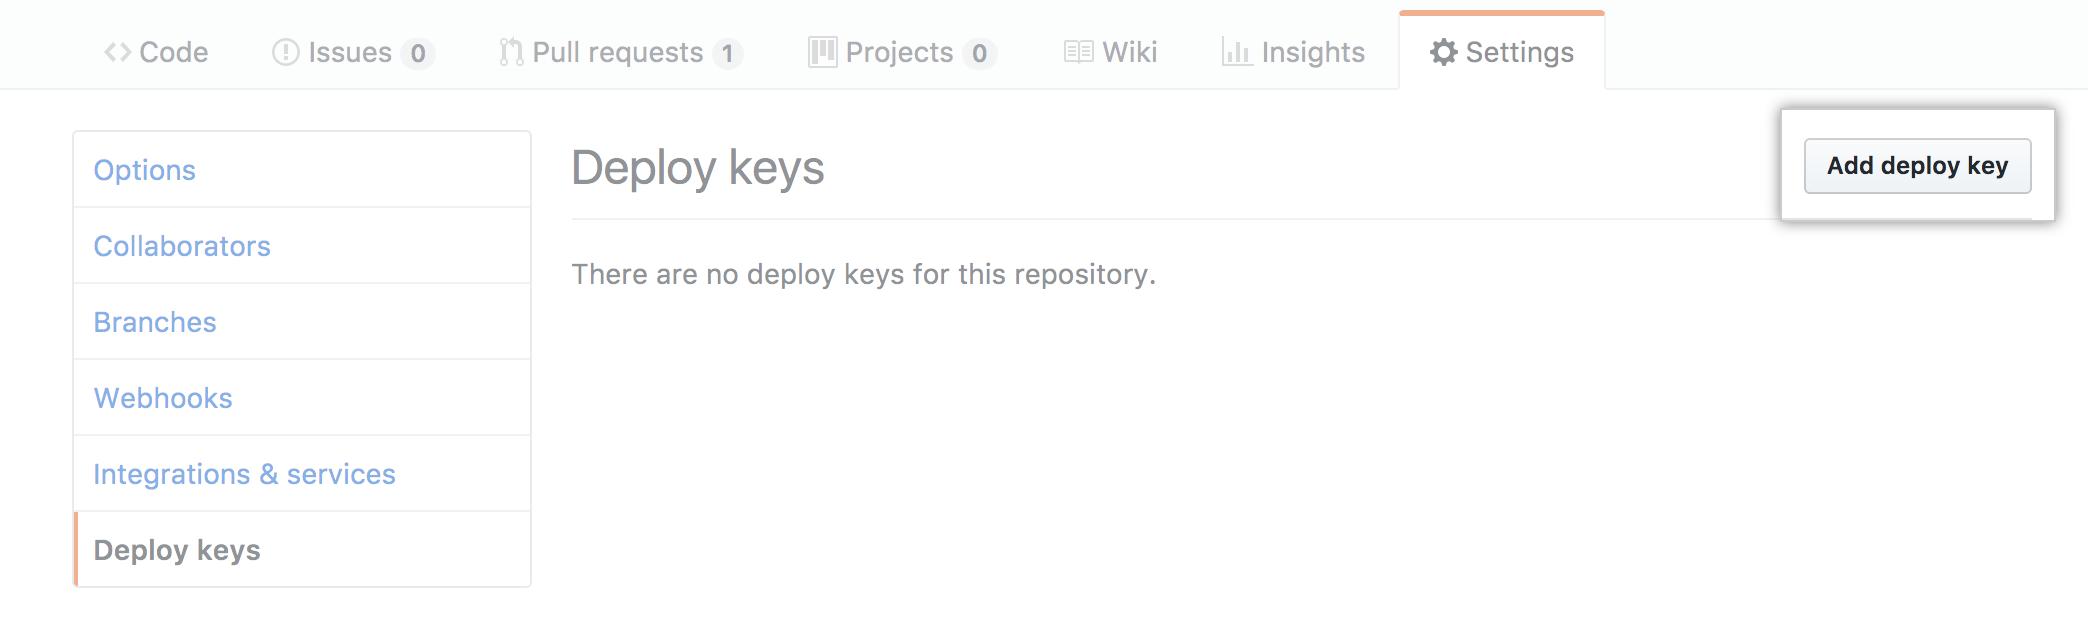 Add Deploy Keys link